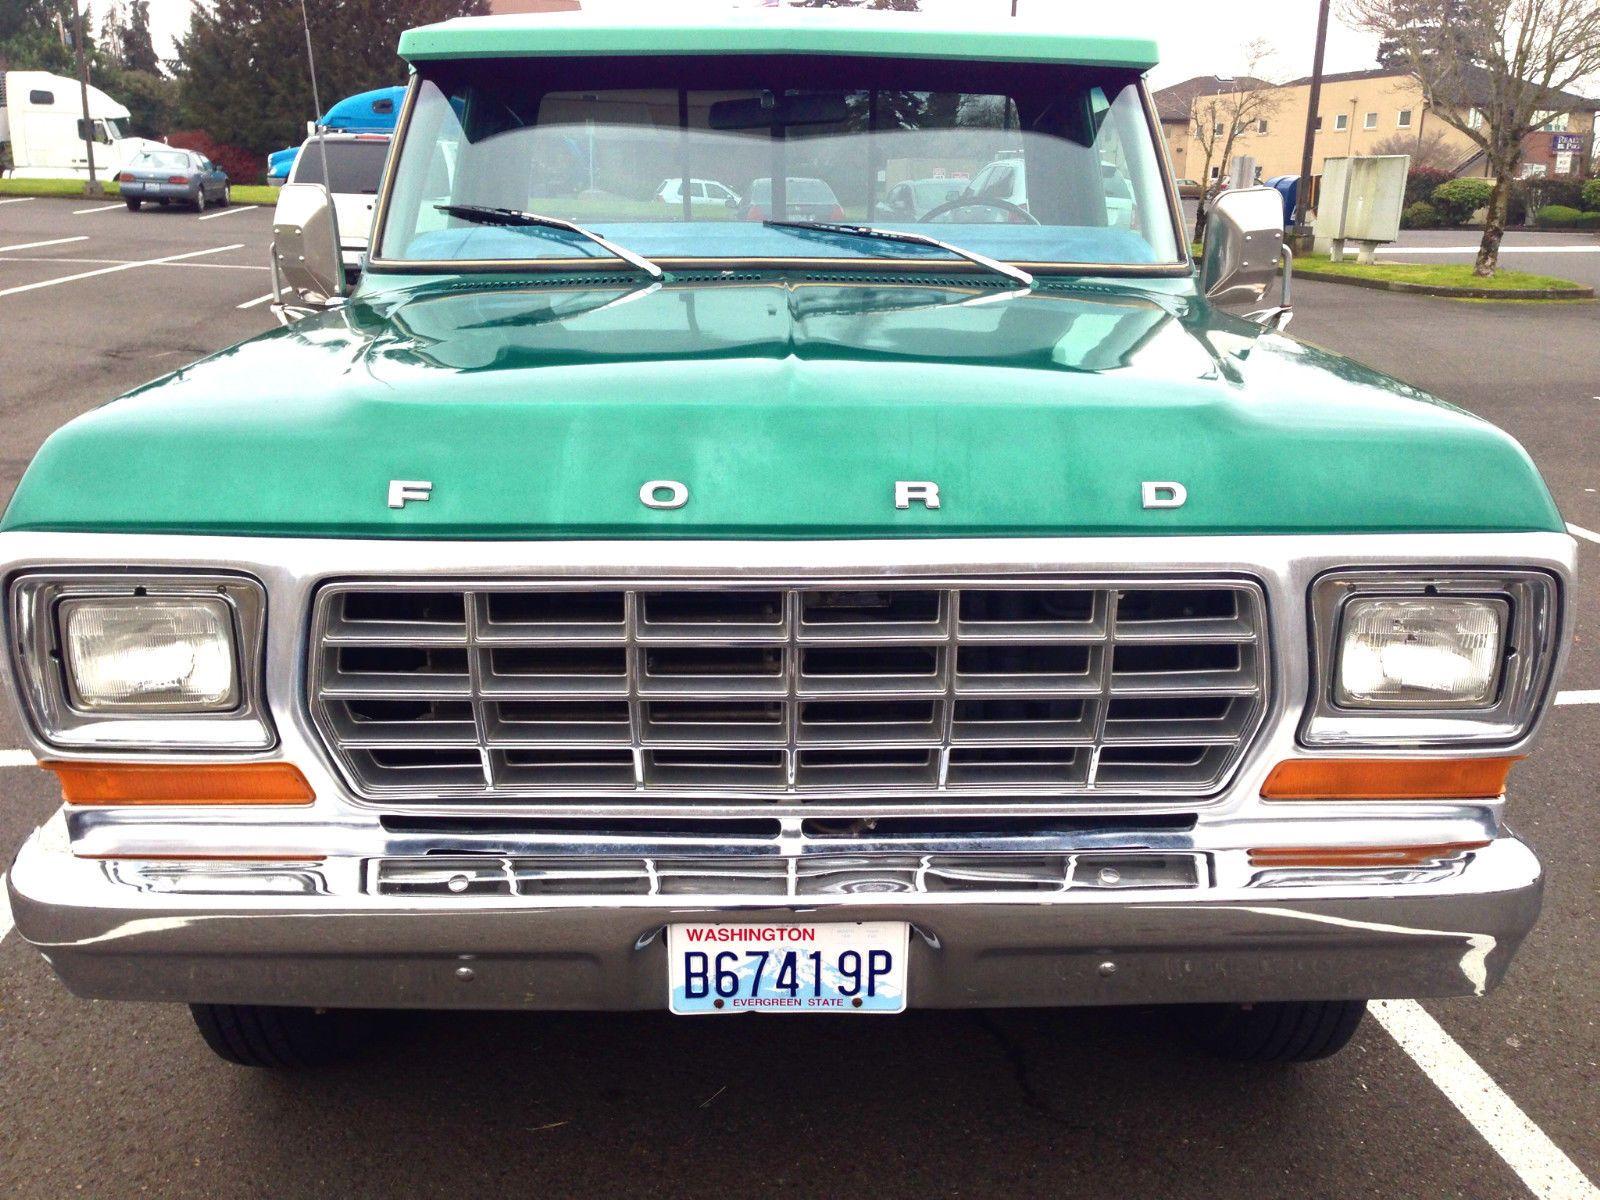 1978 ford f 350 xlt ranger camper special 2wd automatic transmission 460cu v8 [ 1600 x 1200 Pixel ]